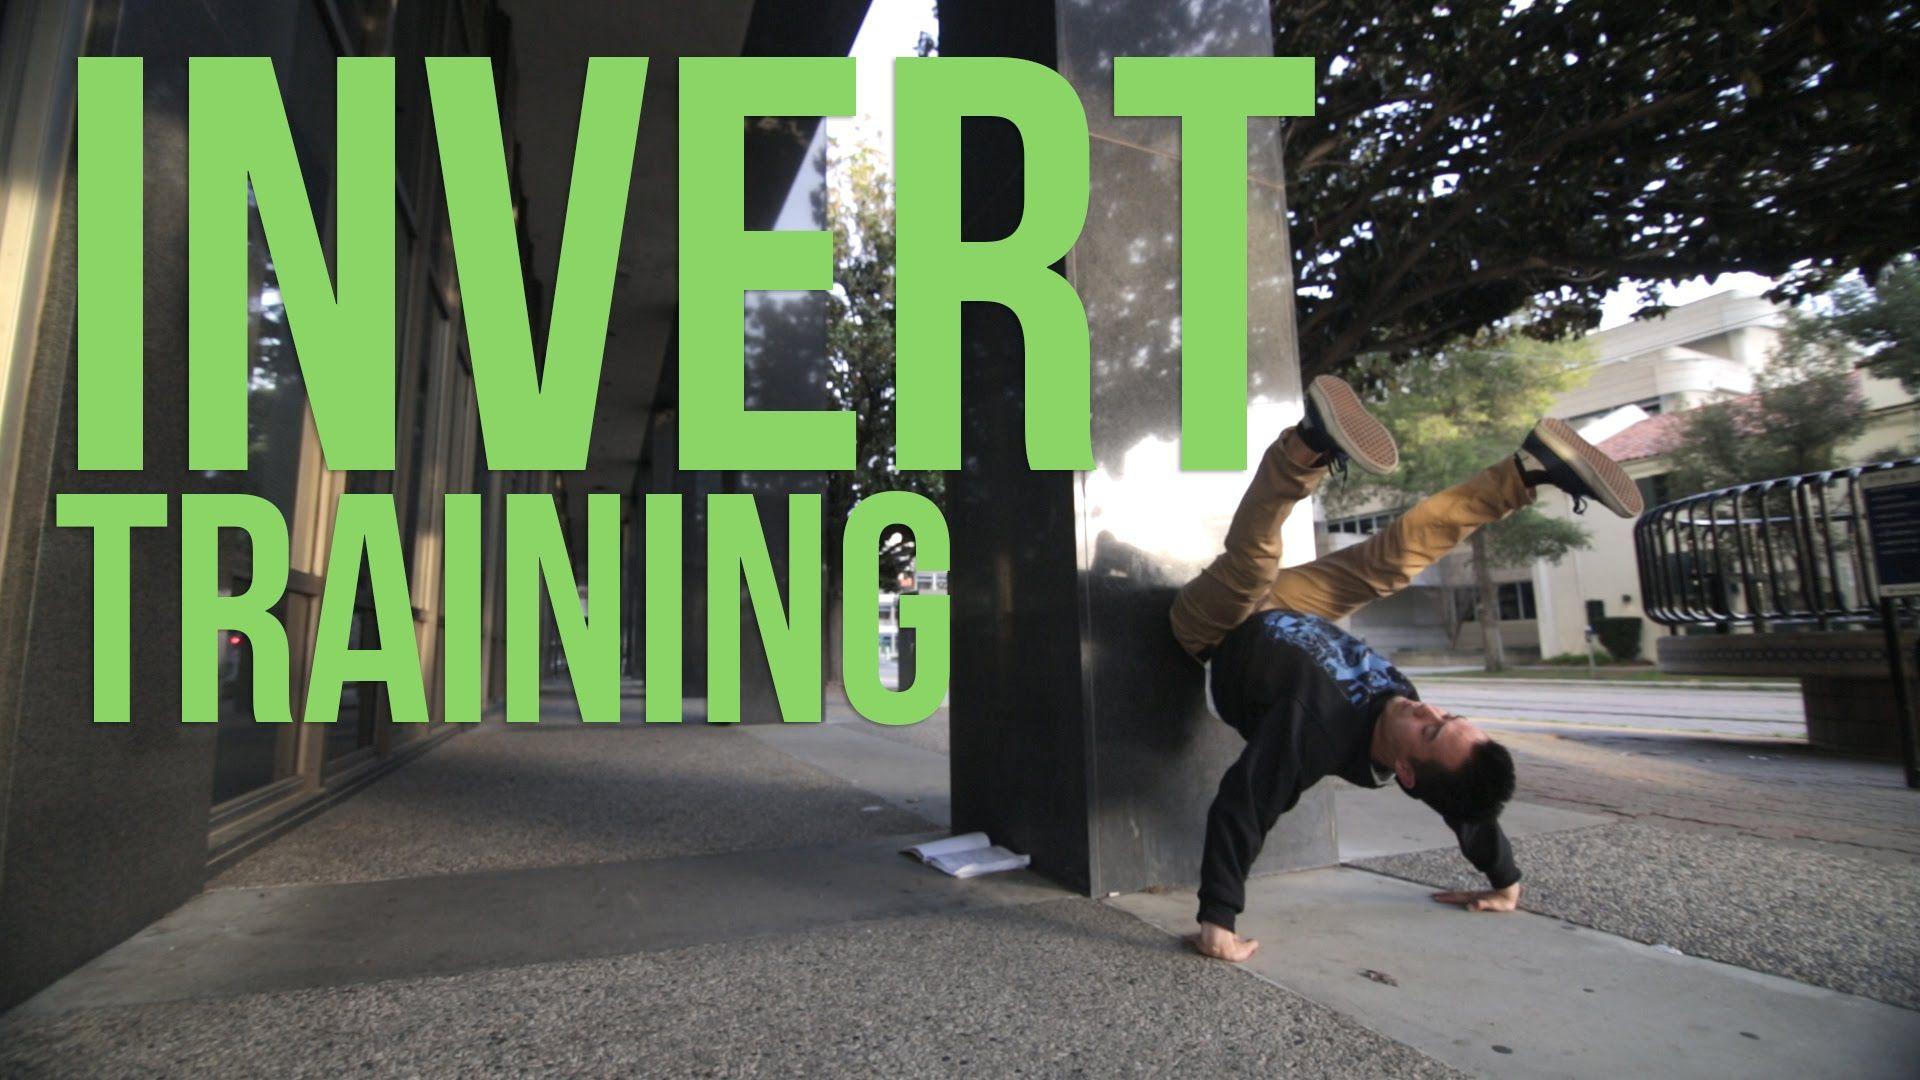 How to breakdance invert training freeze basics how to how to breakdance invert training freeze basics baditri Image collections